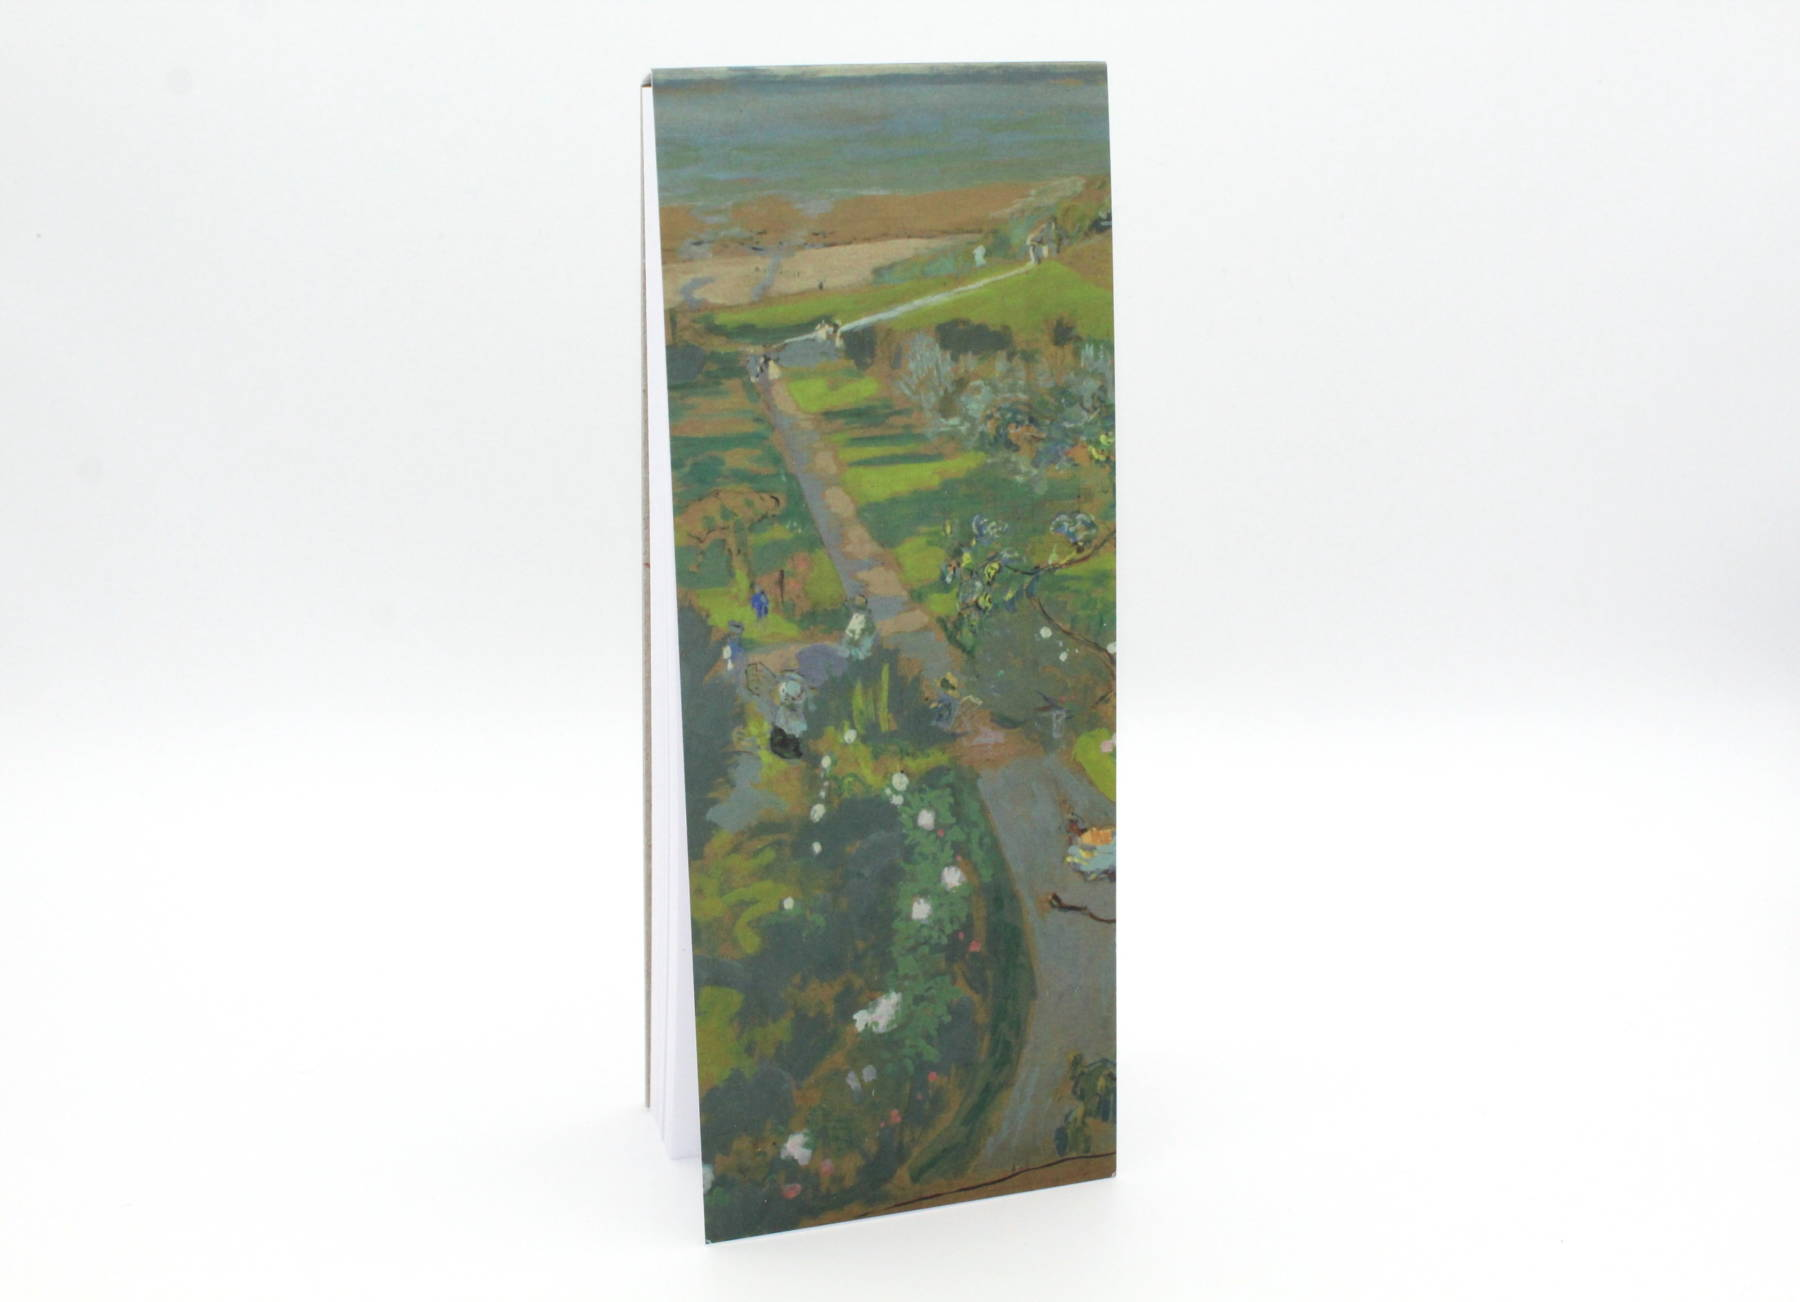 Bloc-notes - Edouard Vuillard, Vue des Pavillons